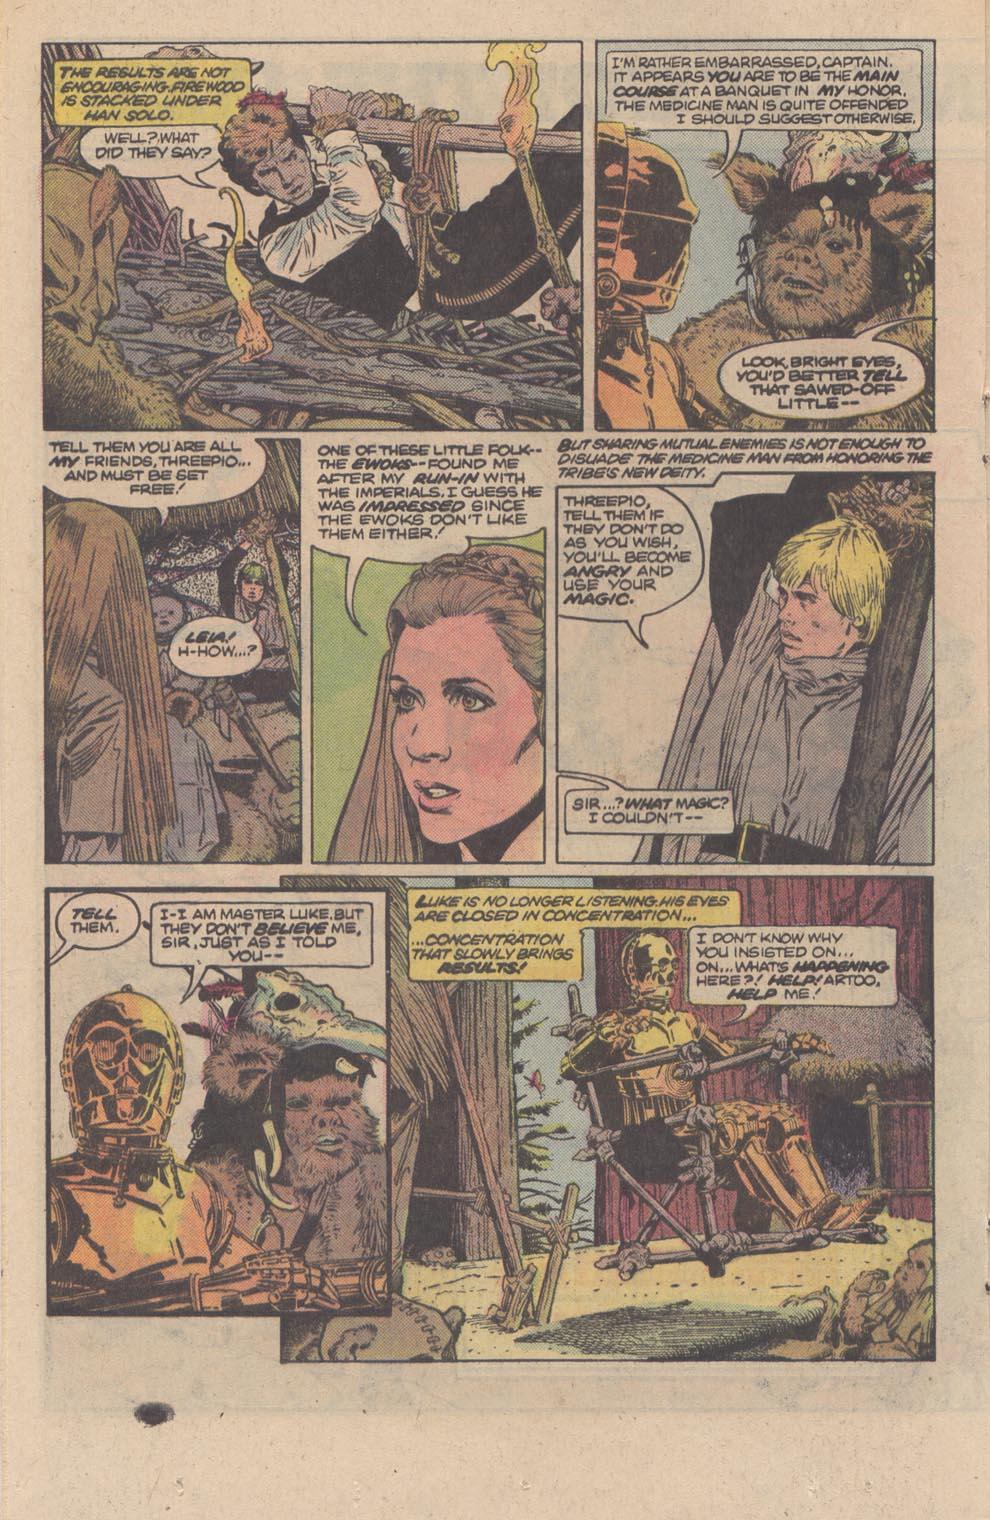 Read online Star Wars: Return of the Jedi comic -  Issue #3 - 16